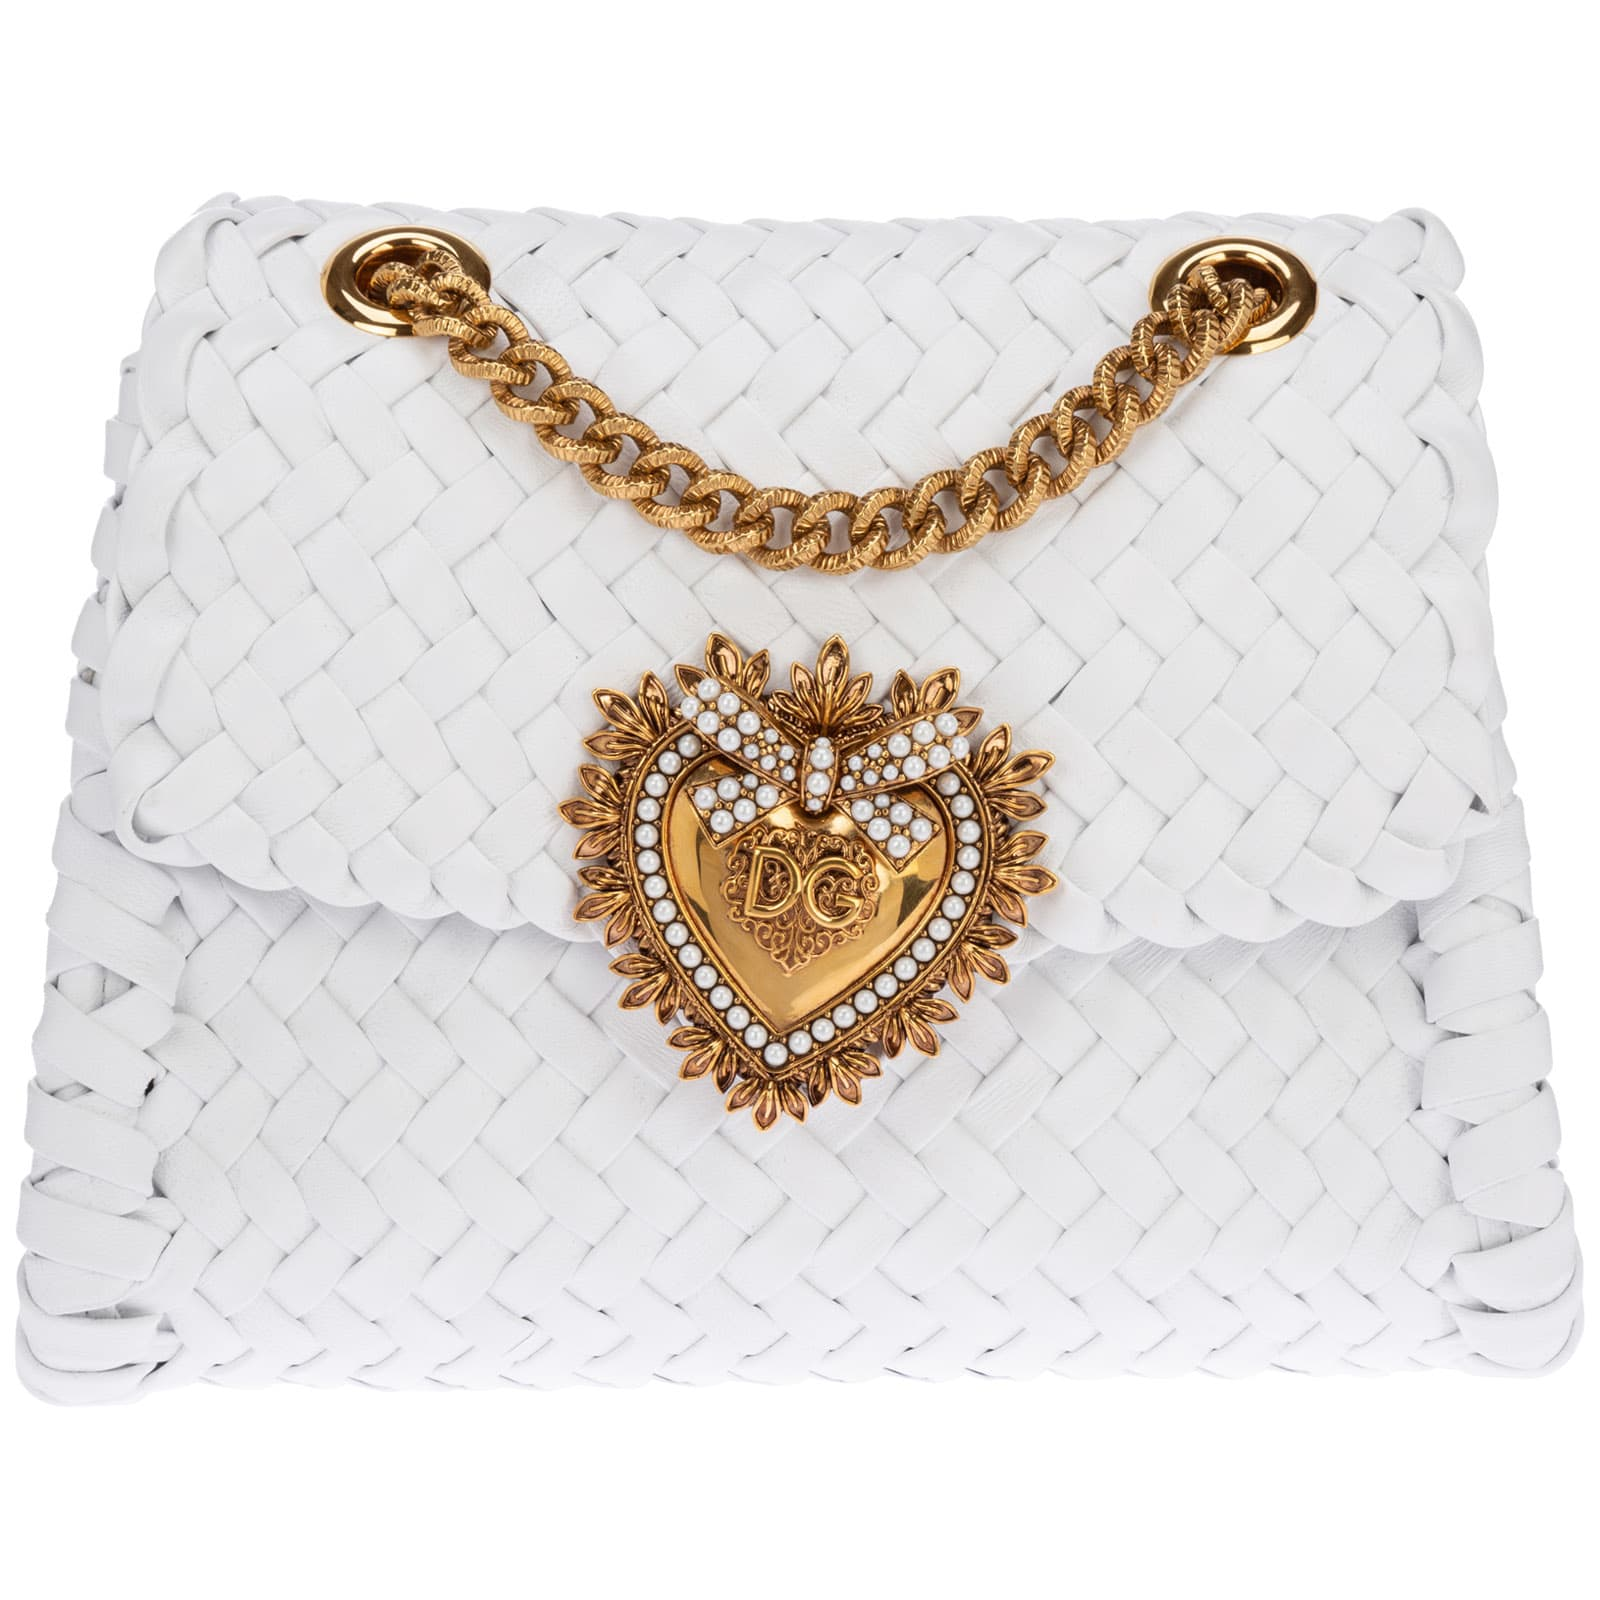 Dolce & Gabbana Devotion Crossbody Bags In Bianco Ottico